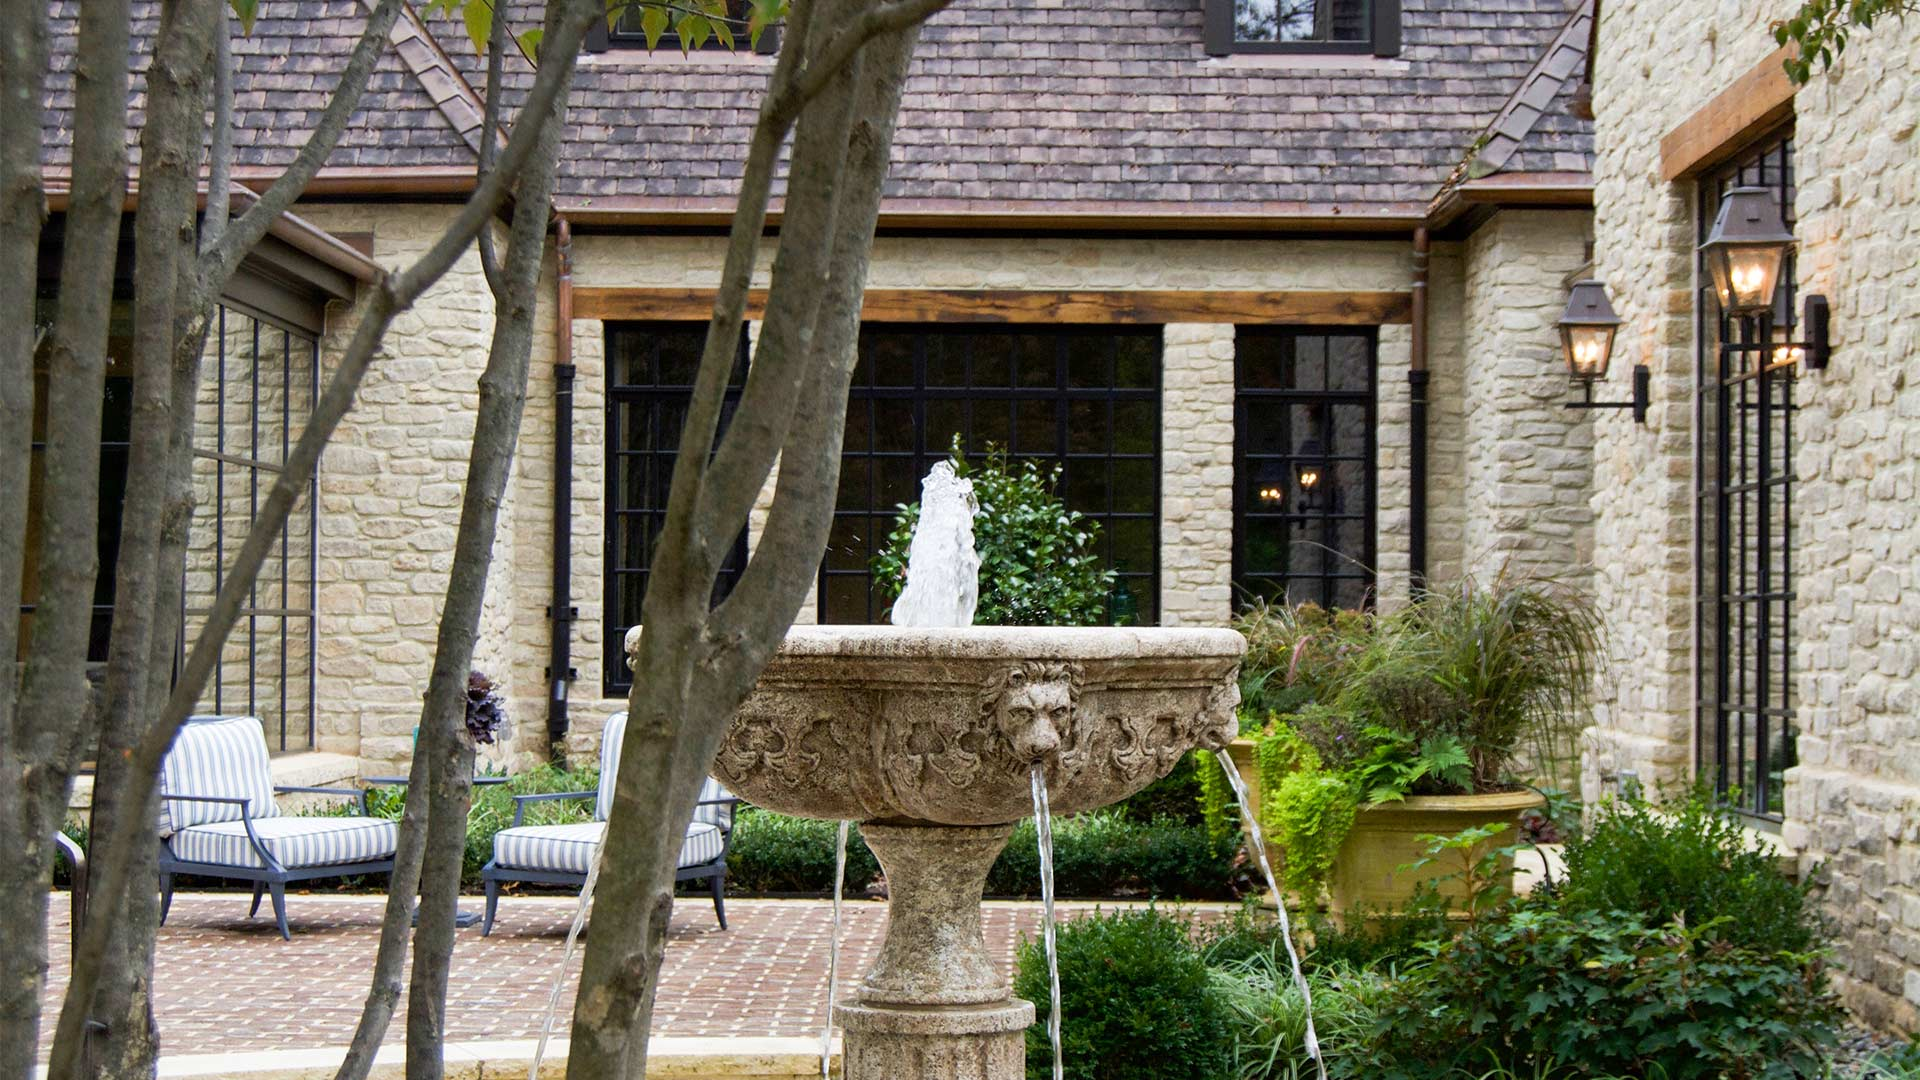 A house with a fountain